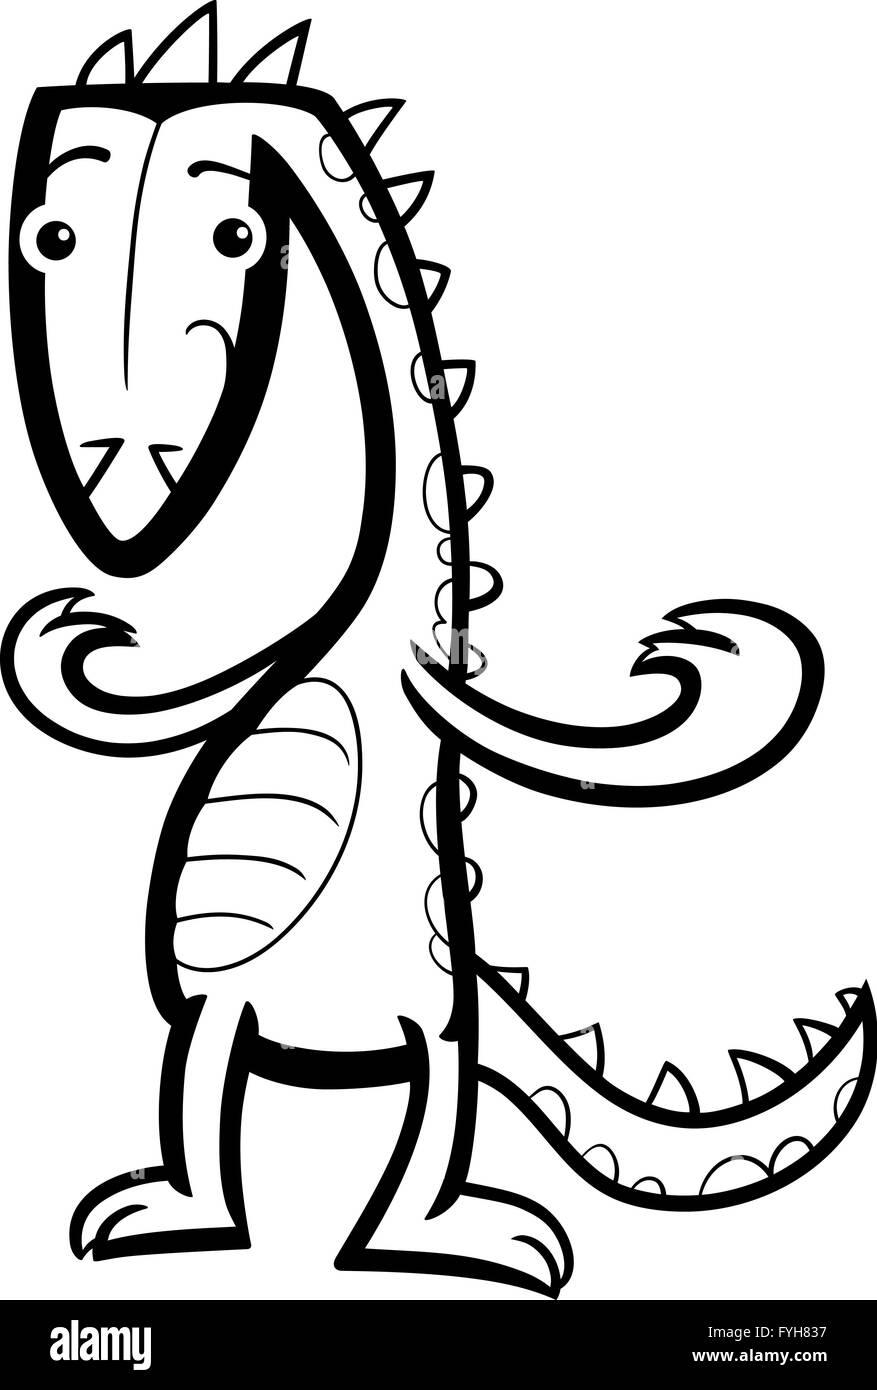 cartoon lizard or dinosaur coloring page - Stock Image